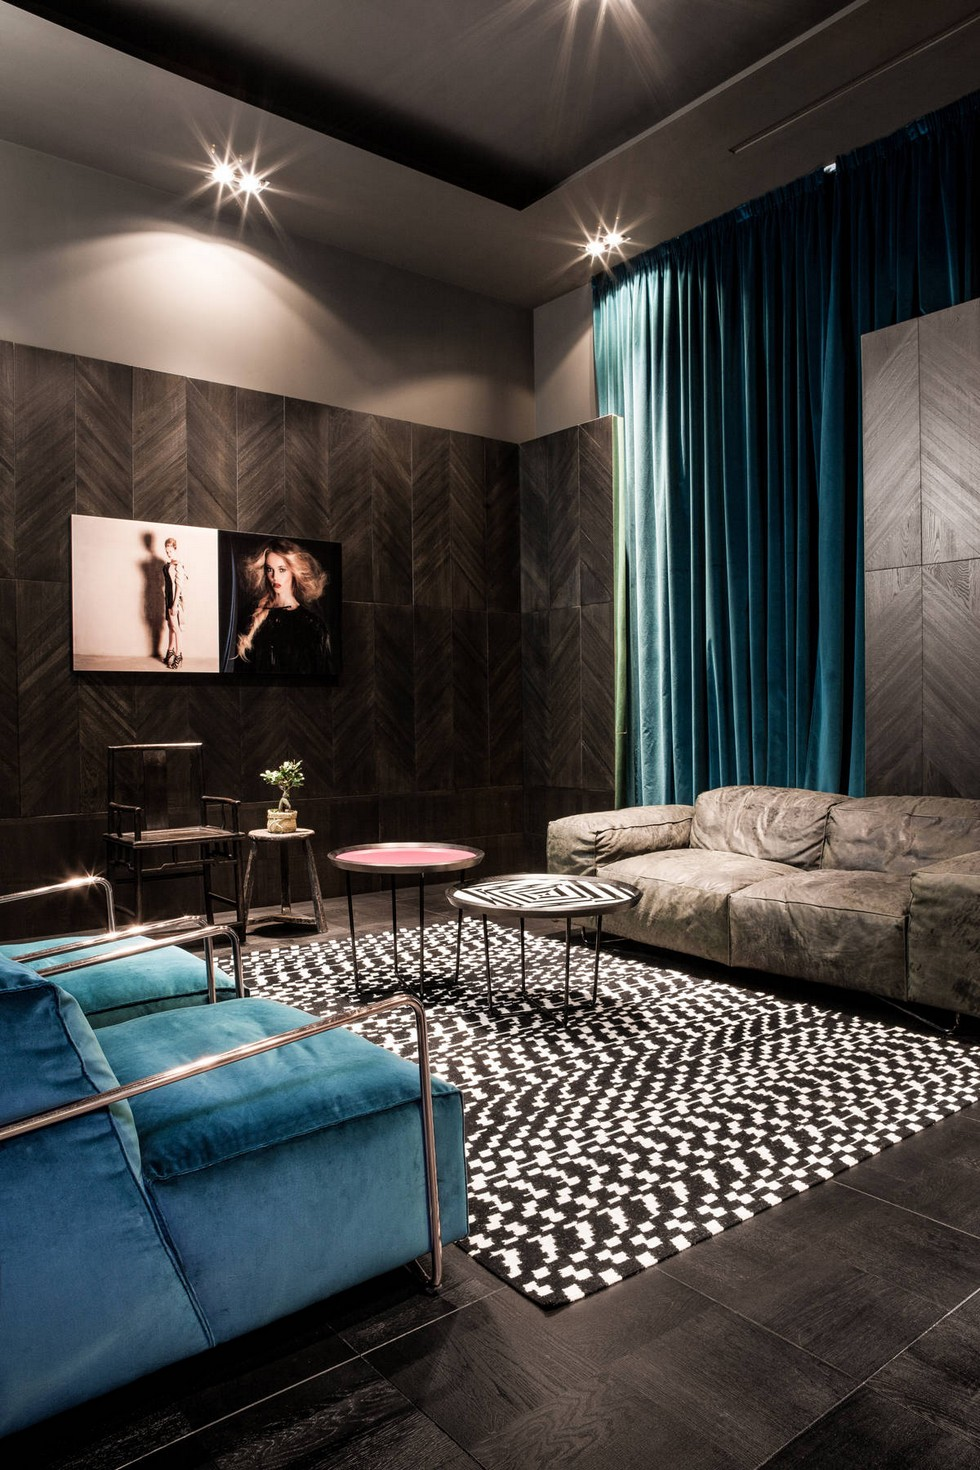 Living room ideas by Maison Giopagani best milan showrooms Best Milan showrooms to visit today – Atelier Maison Giopagani Best Milan showrooms to visit today Atelier Maison Giopagani 7